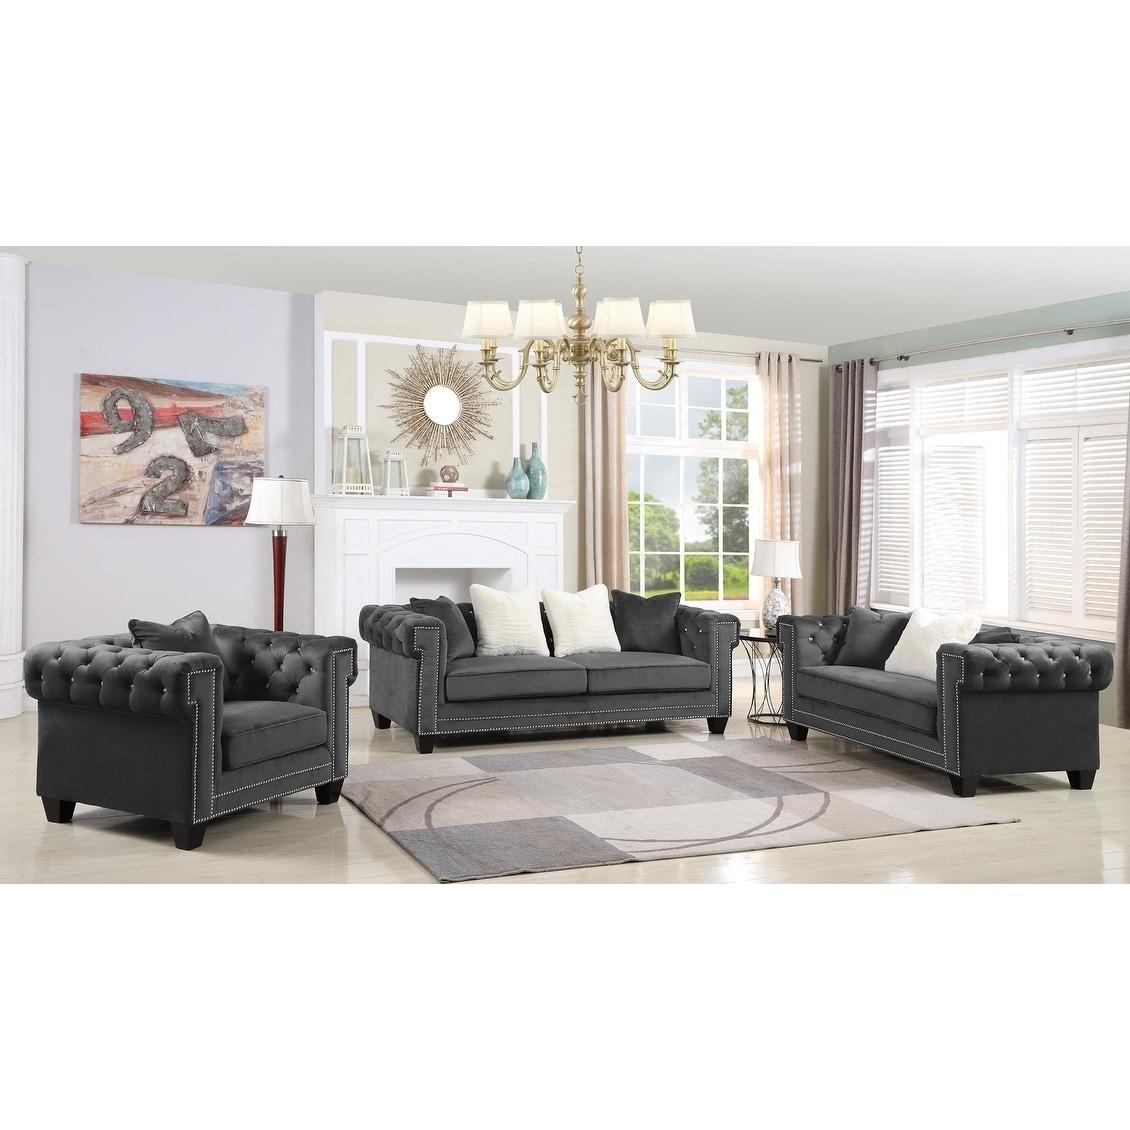 Shop Best Master Furniture Velvet Upholstered 3 Pcs Living Room Set ...